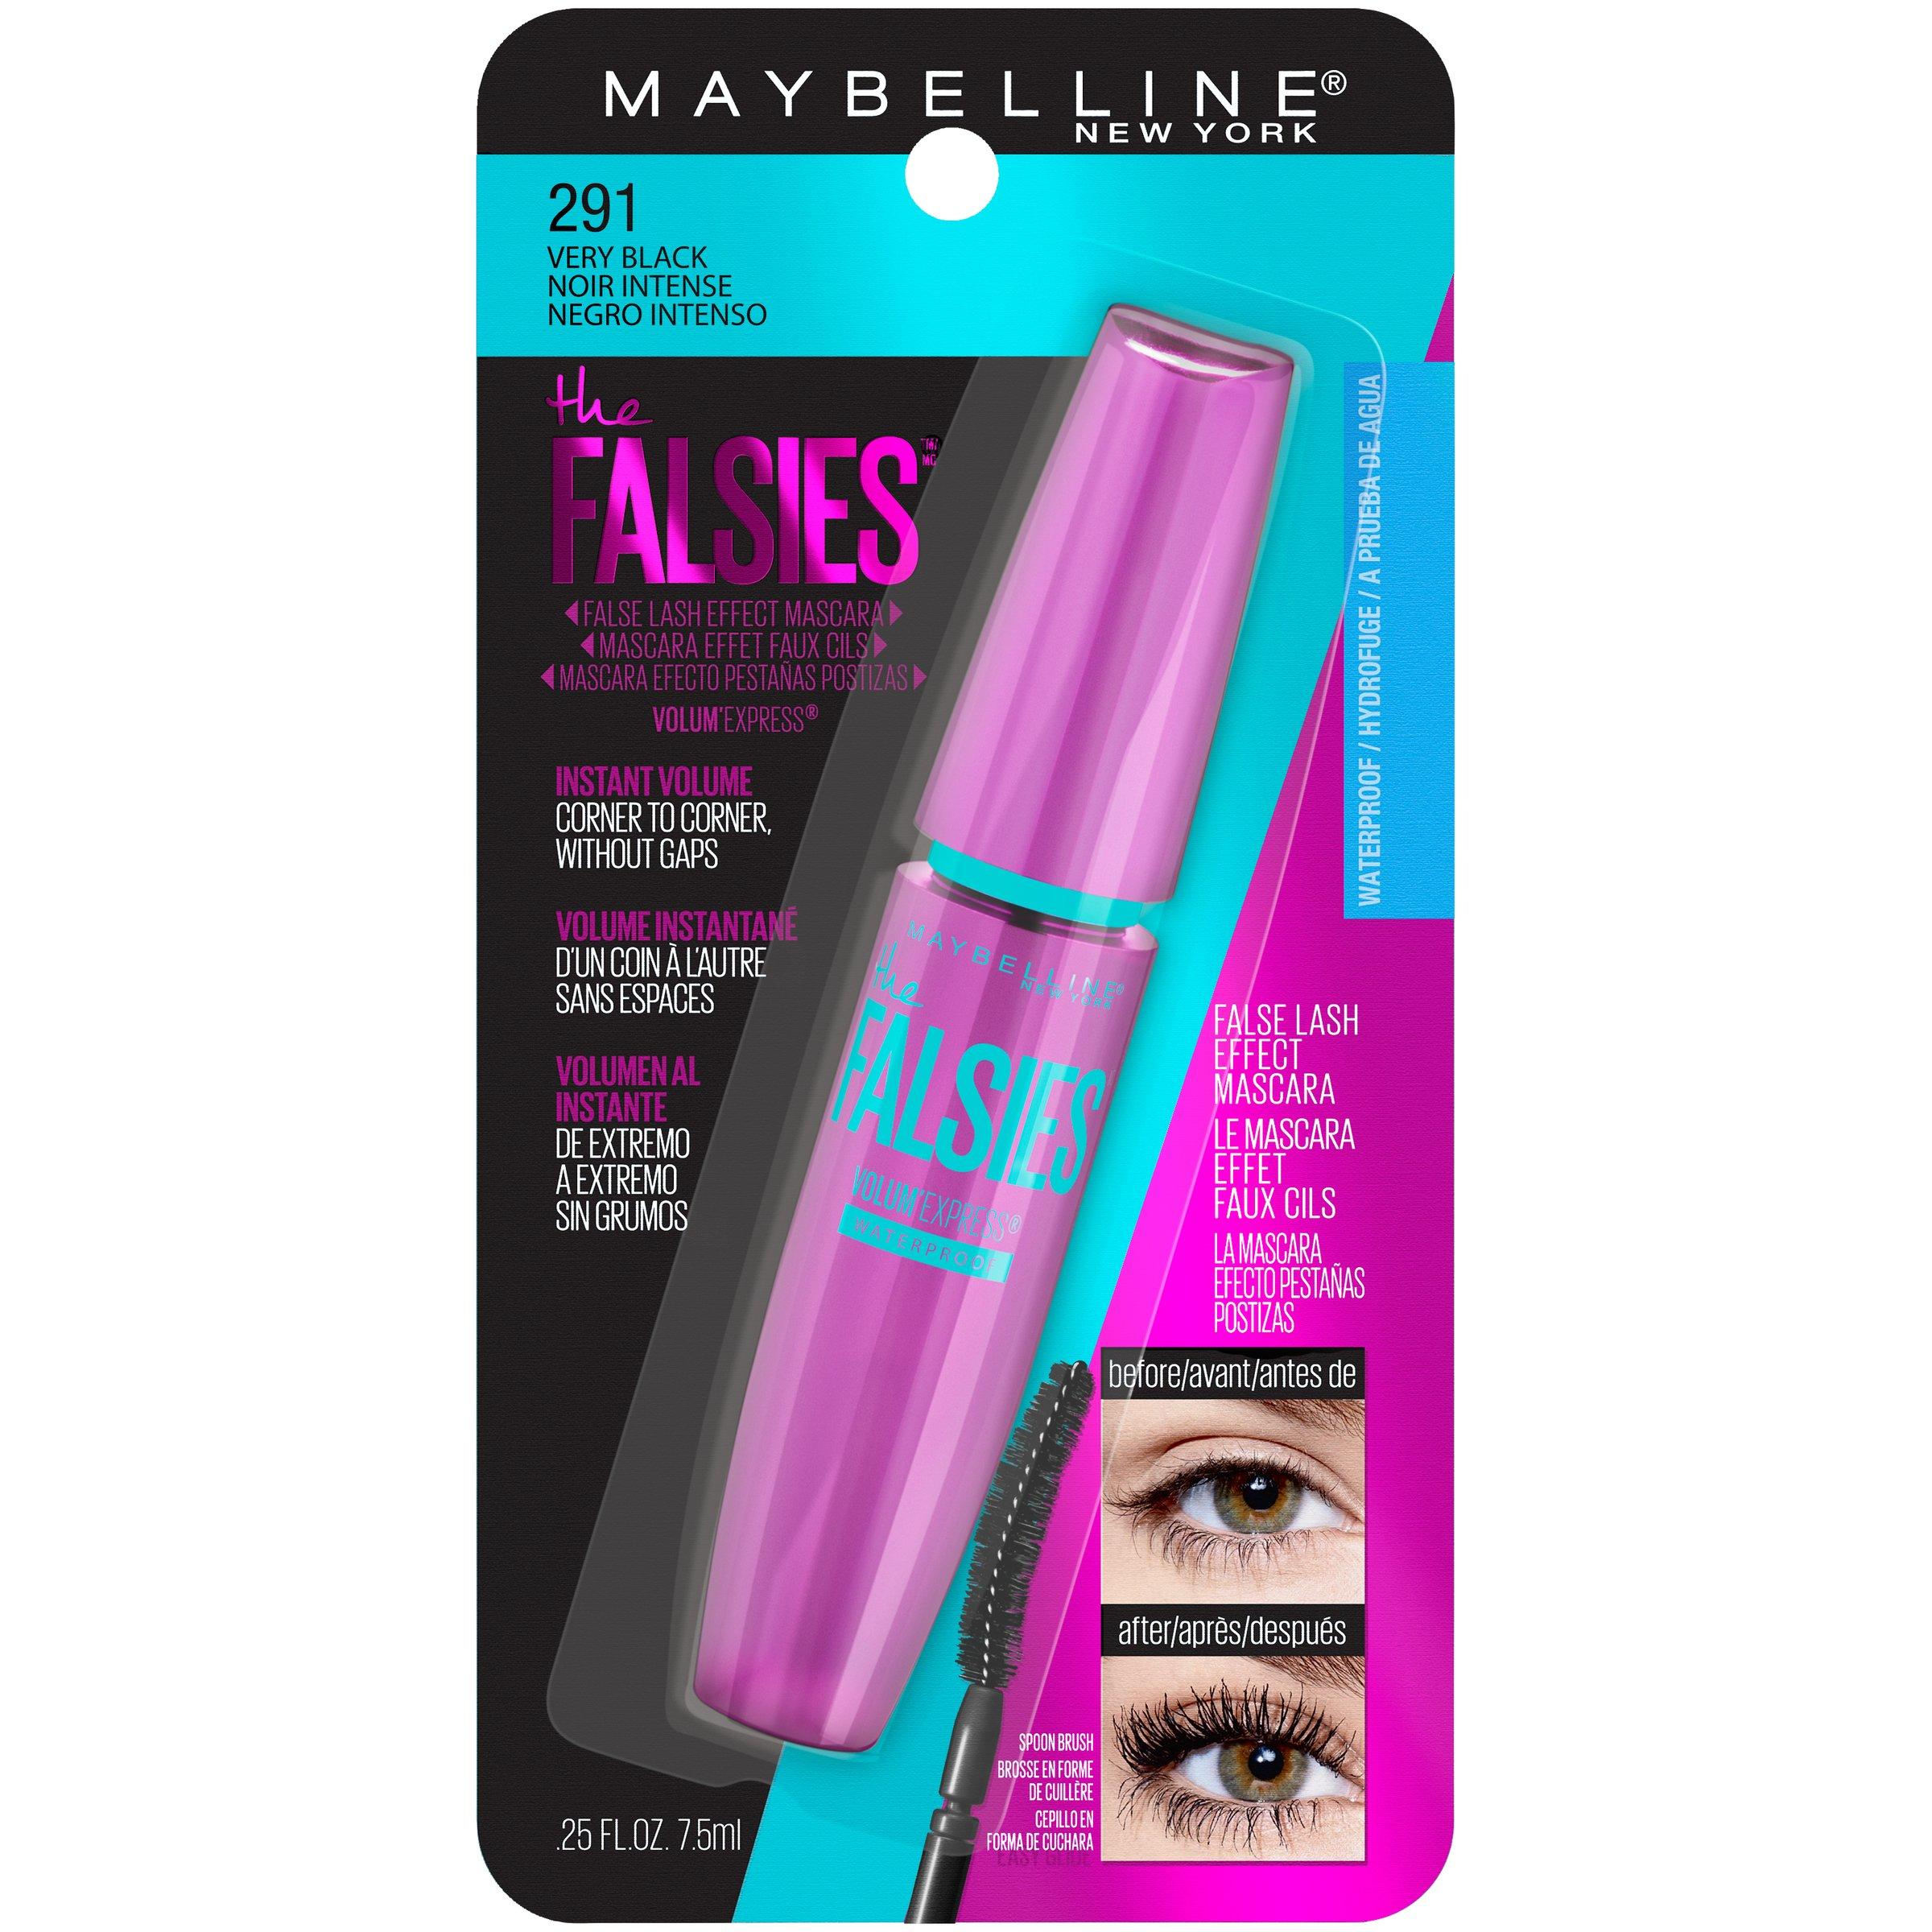 maybelline waterproof mascara